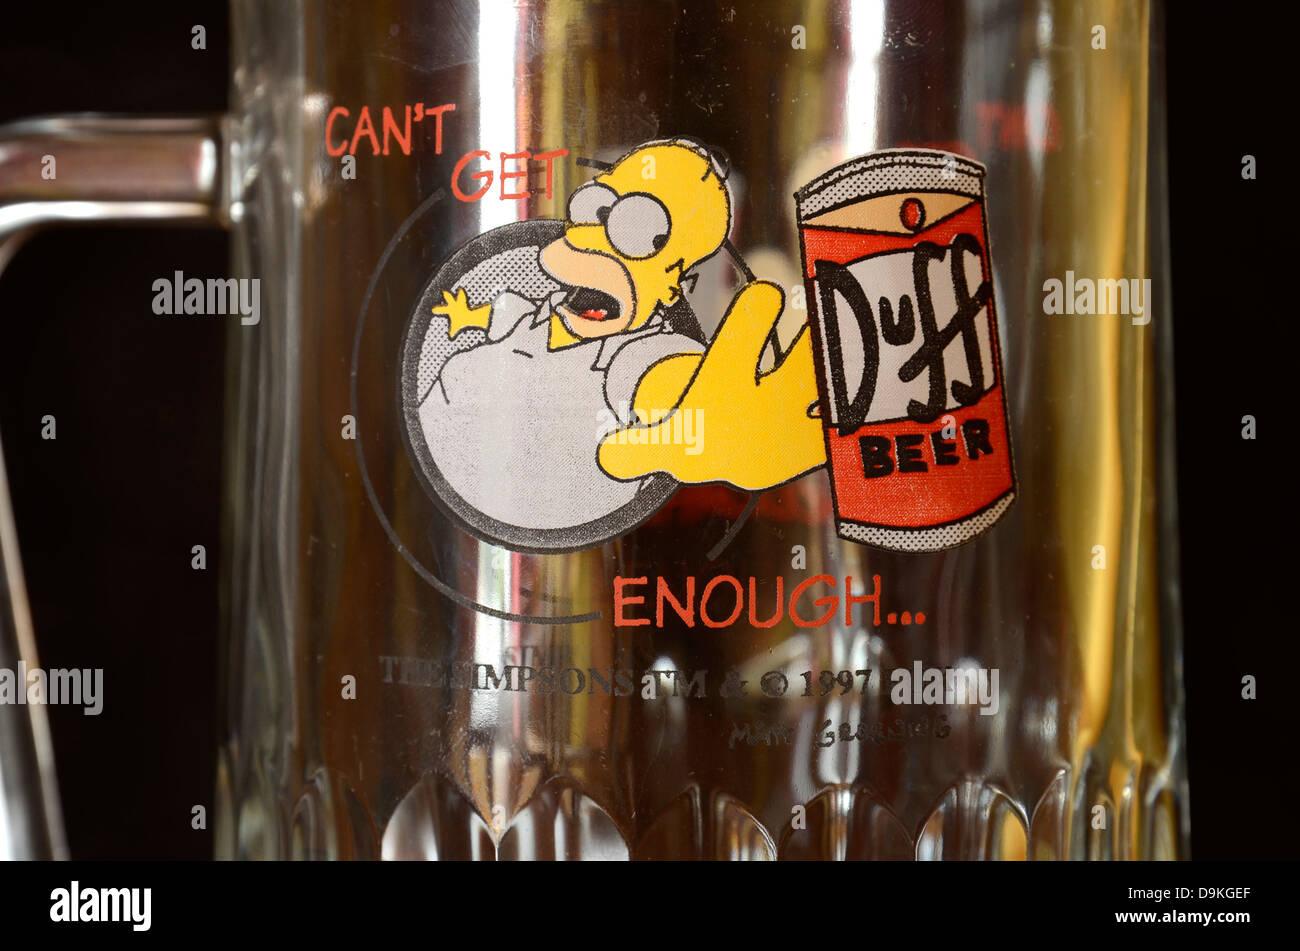 A Homer Simpson 'duff beer' beer glass - Stock Image